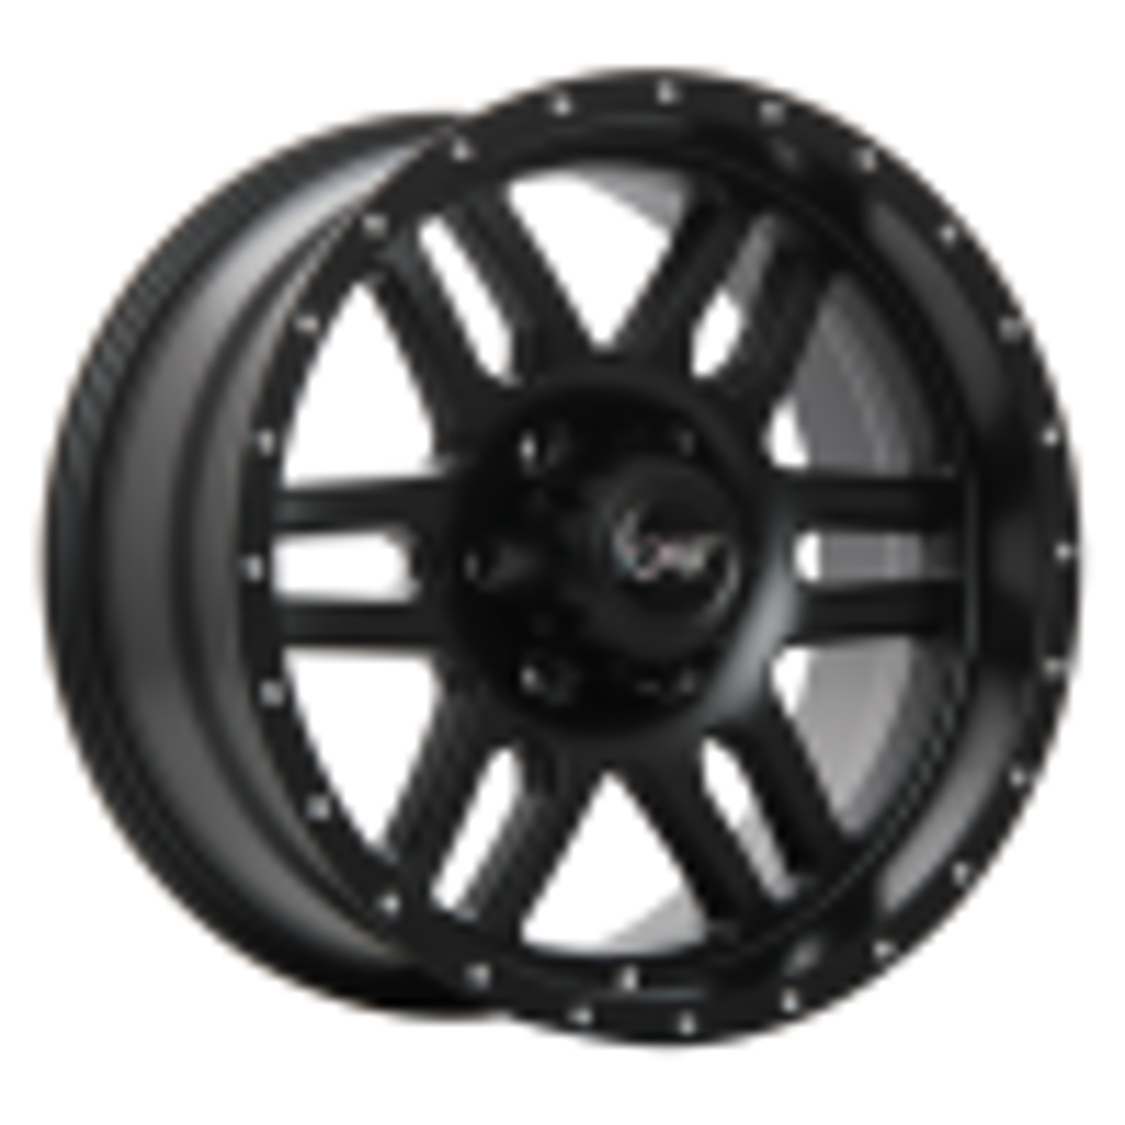 DAI Wheels Truck Satin Black